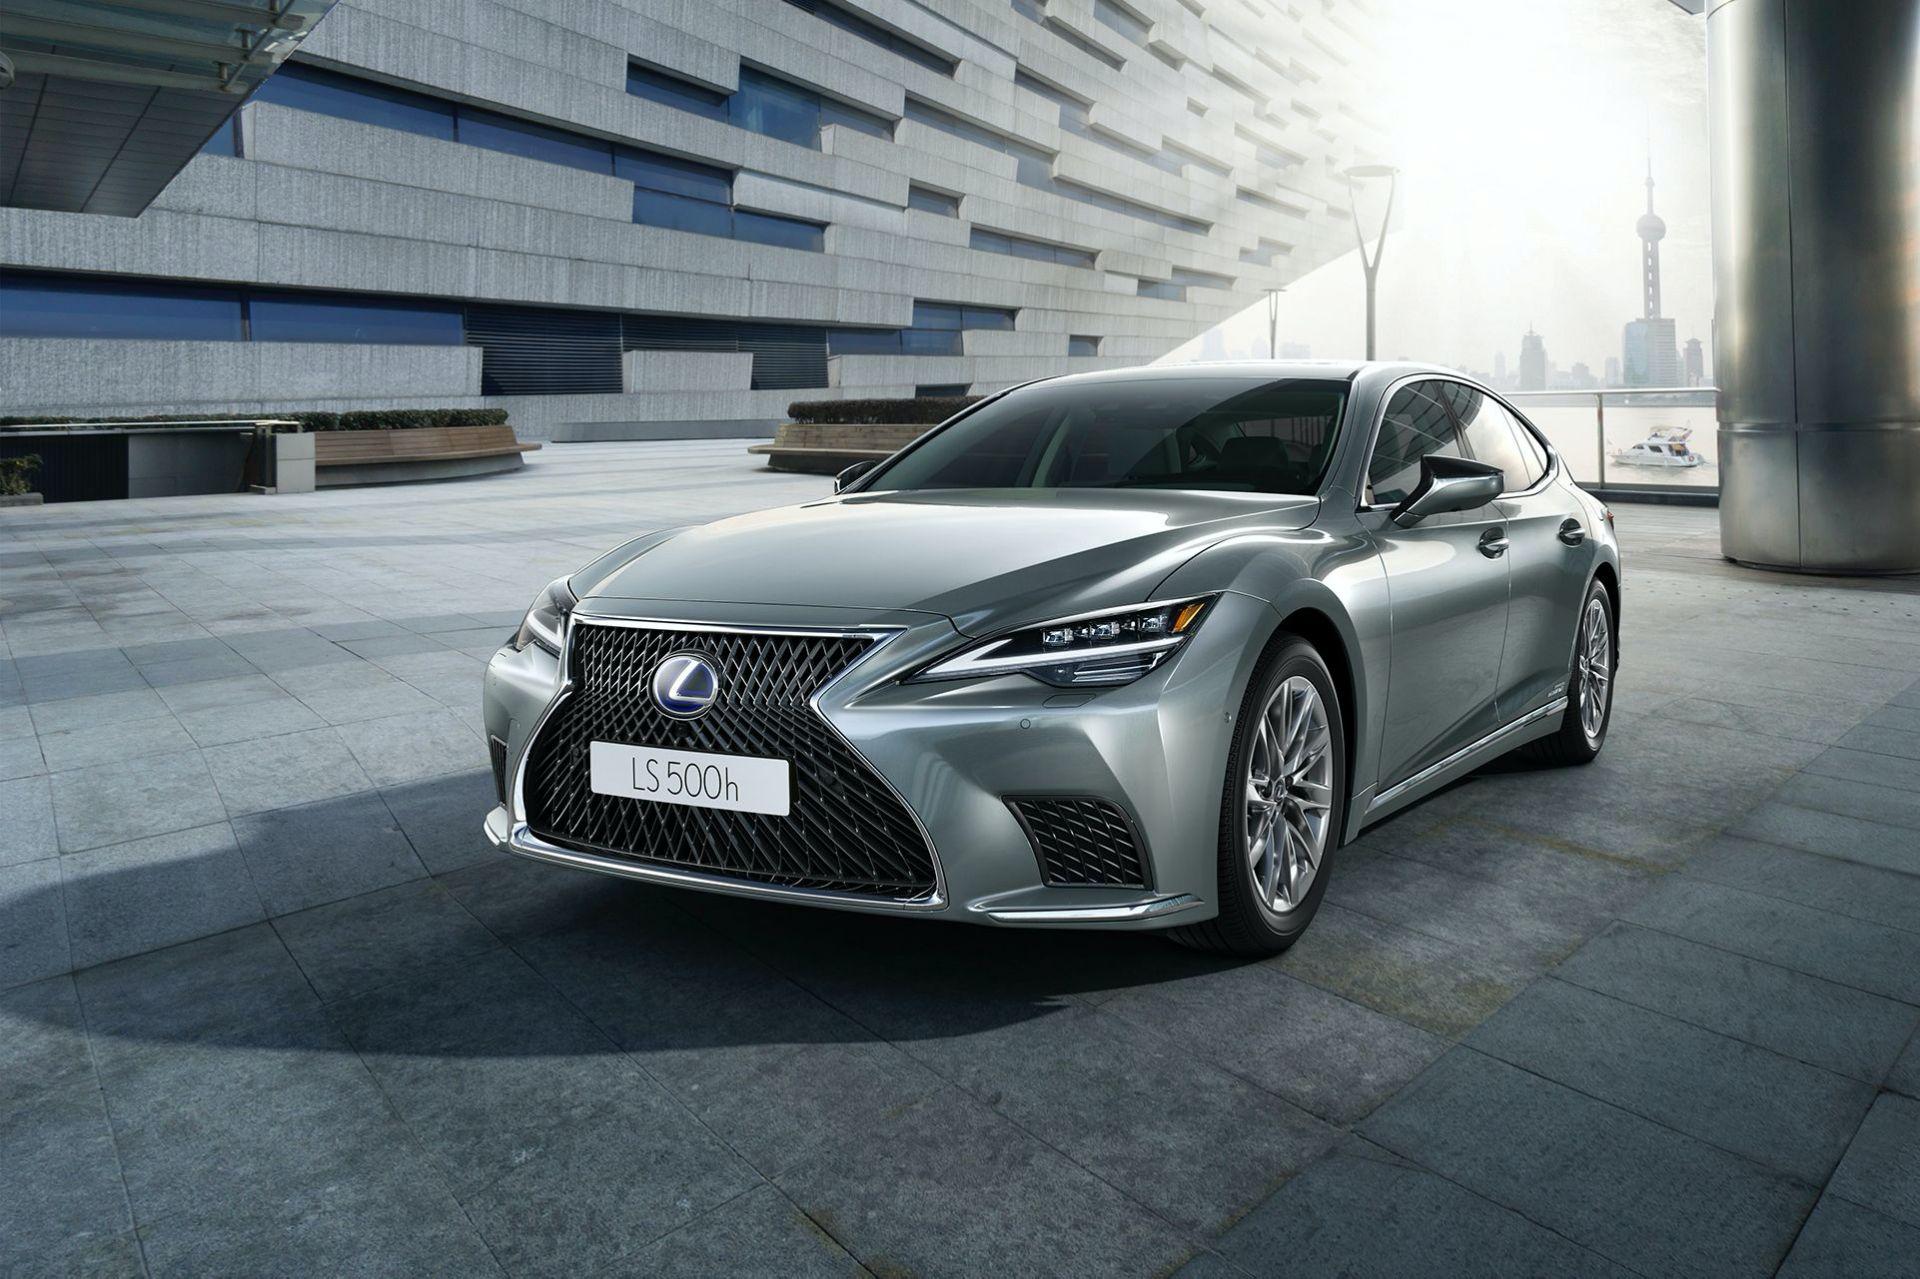 facelifted 2021 lexus ls revealed for european market